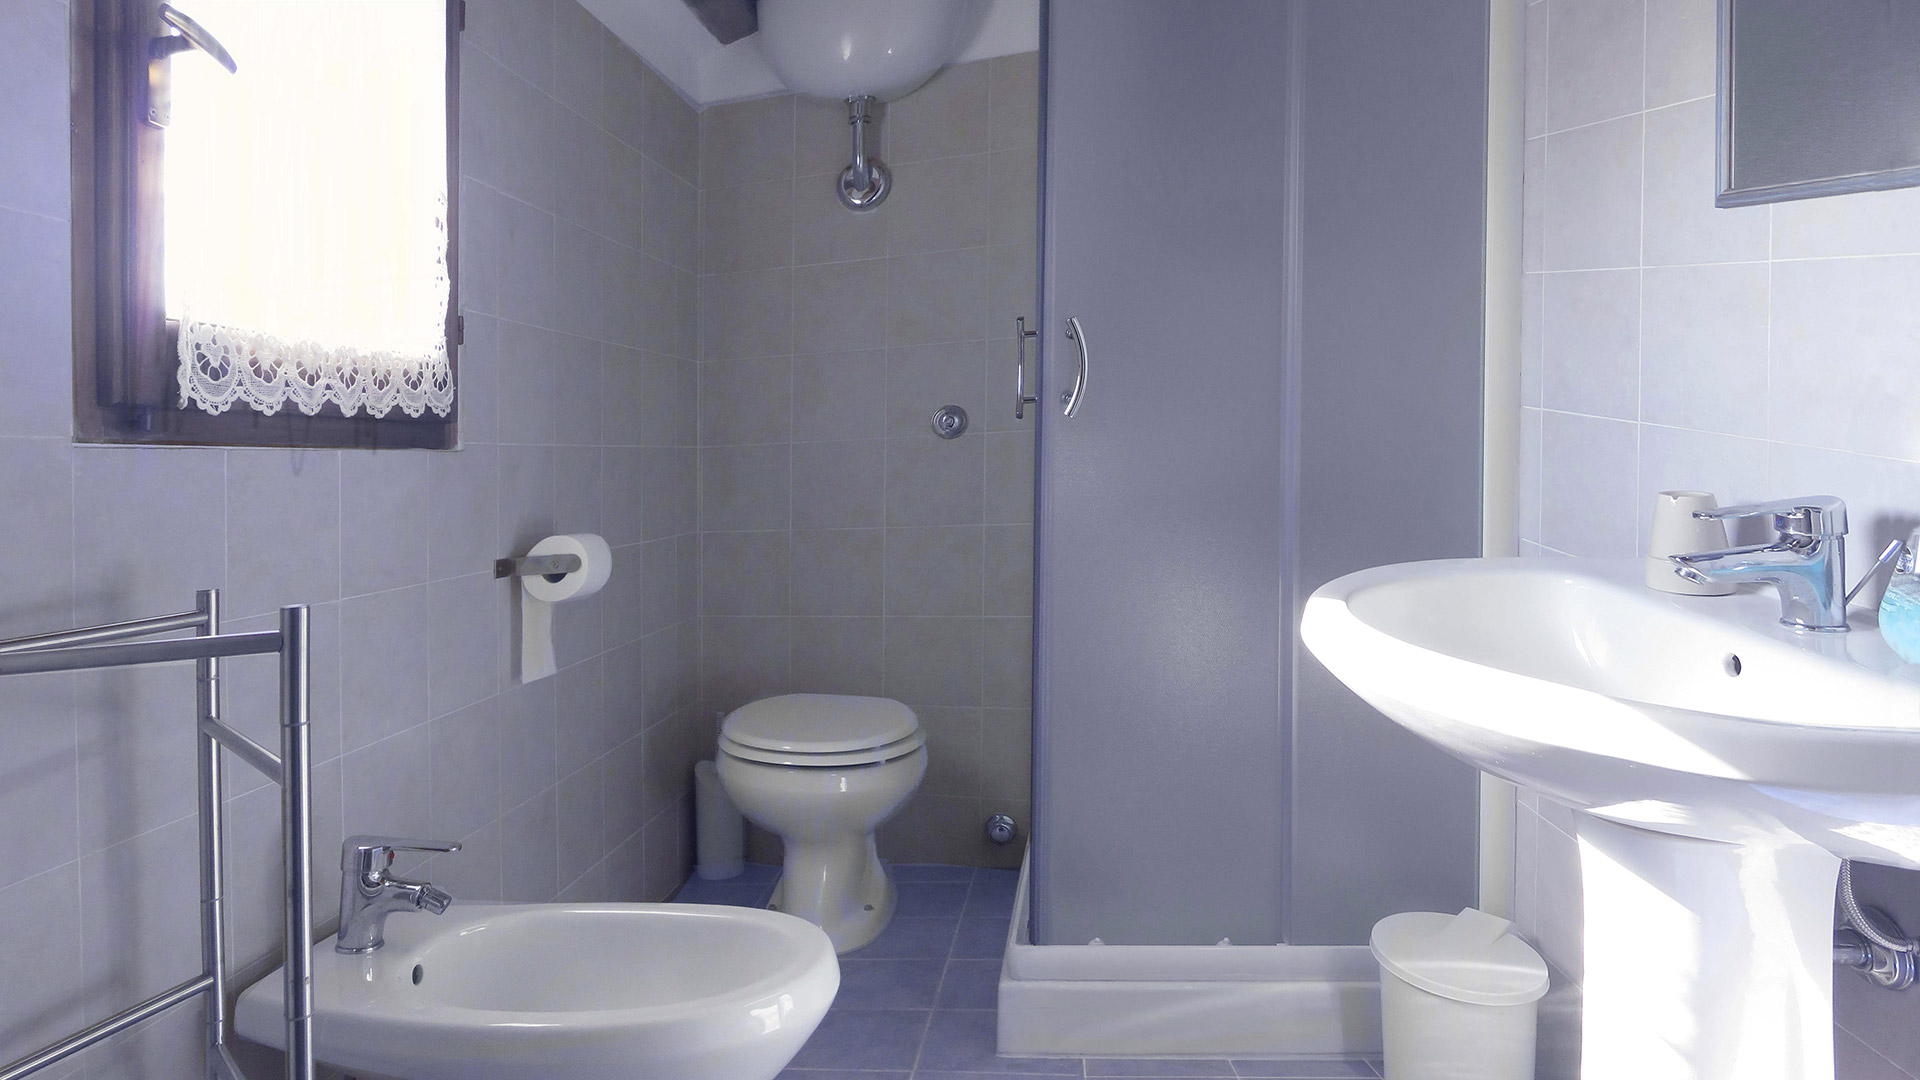 Camera-Mizar-bagno